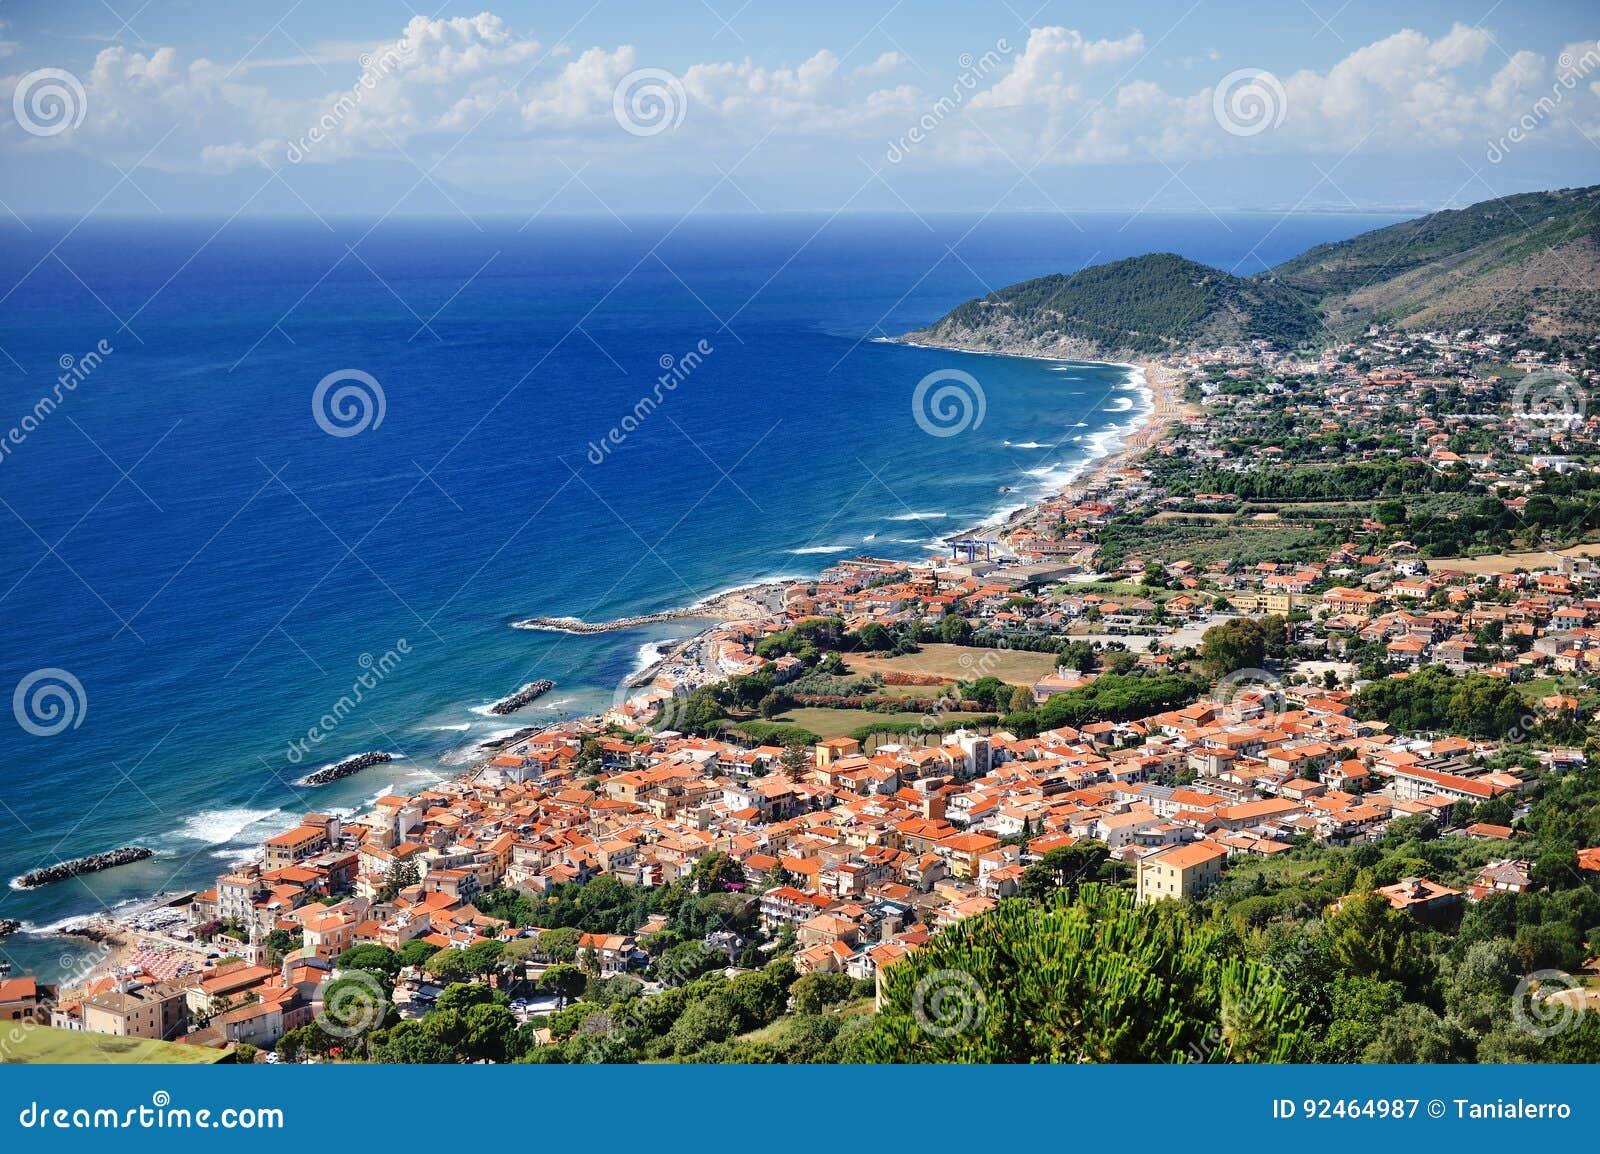 Castellabate scenic panoramic view, Cilento, Campania, Italy